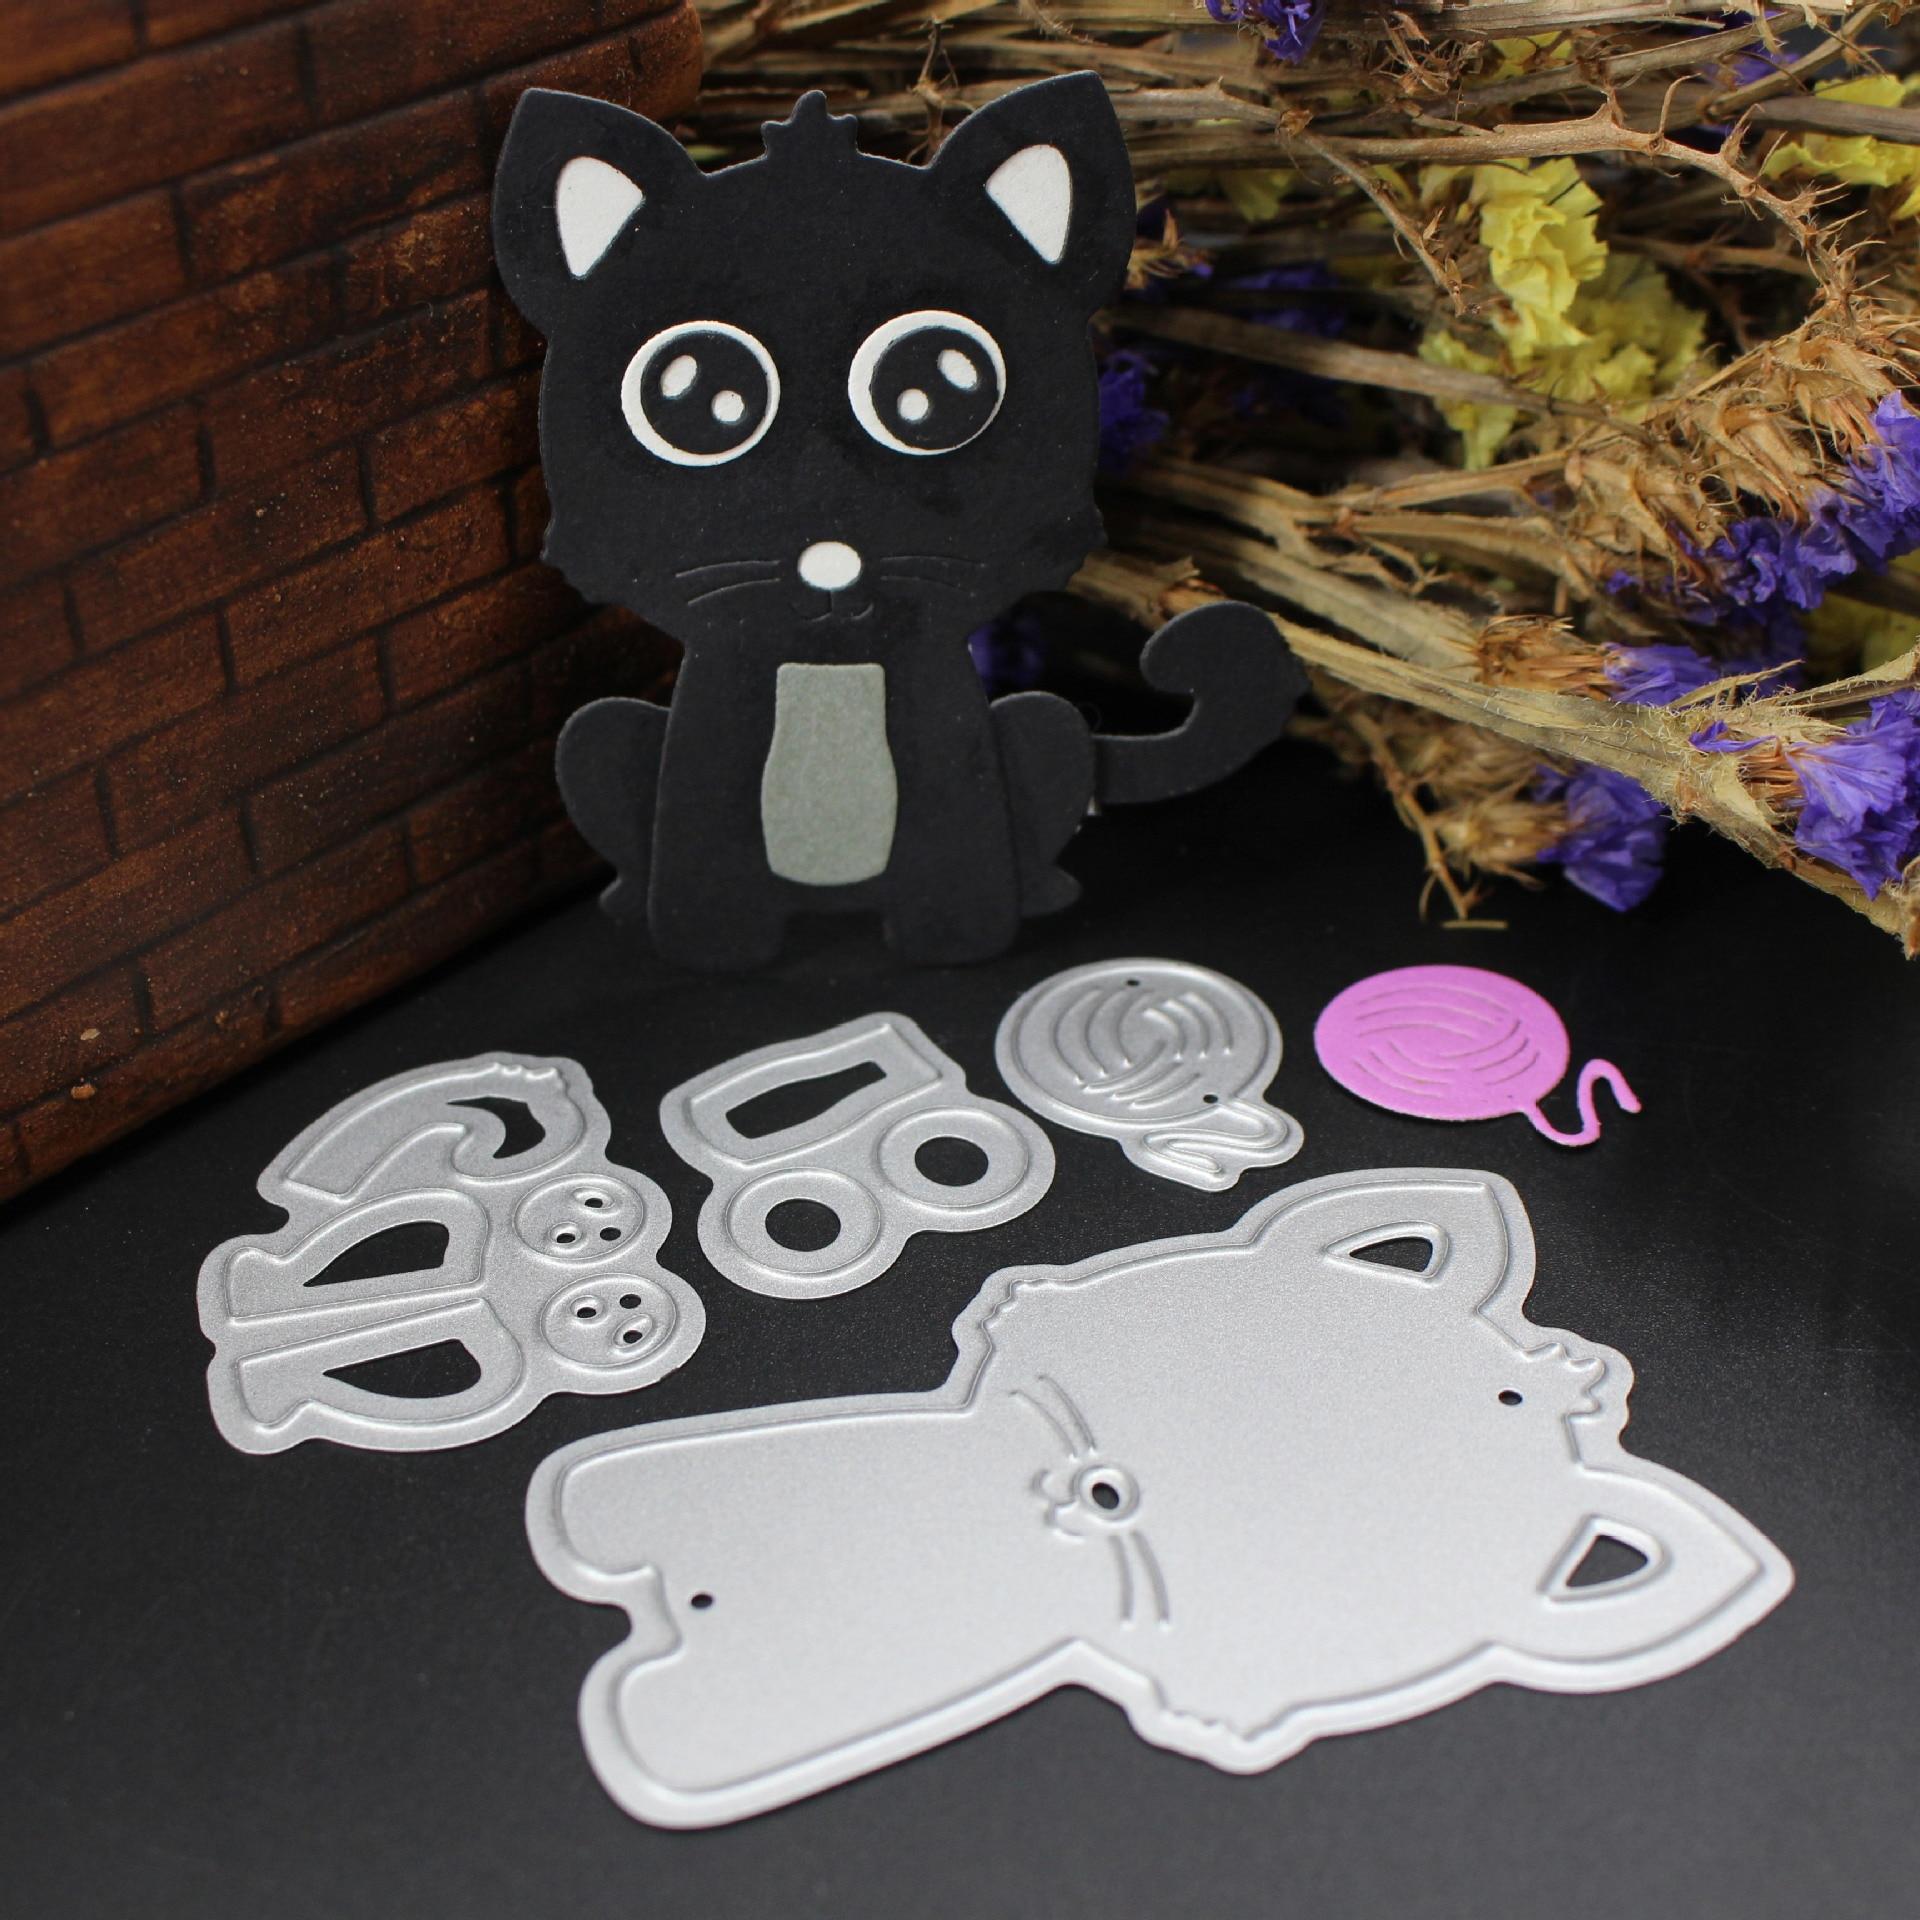 AZSG Kitten Cutting Dies For DIY Scrapbooking Decoretive Embossing Stencial DIY Decoative Cards Die Cutter in Cutting Dies from Home Garden